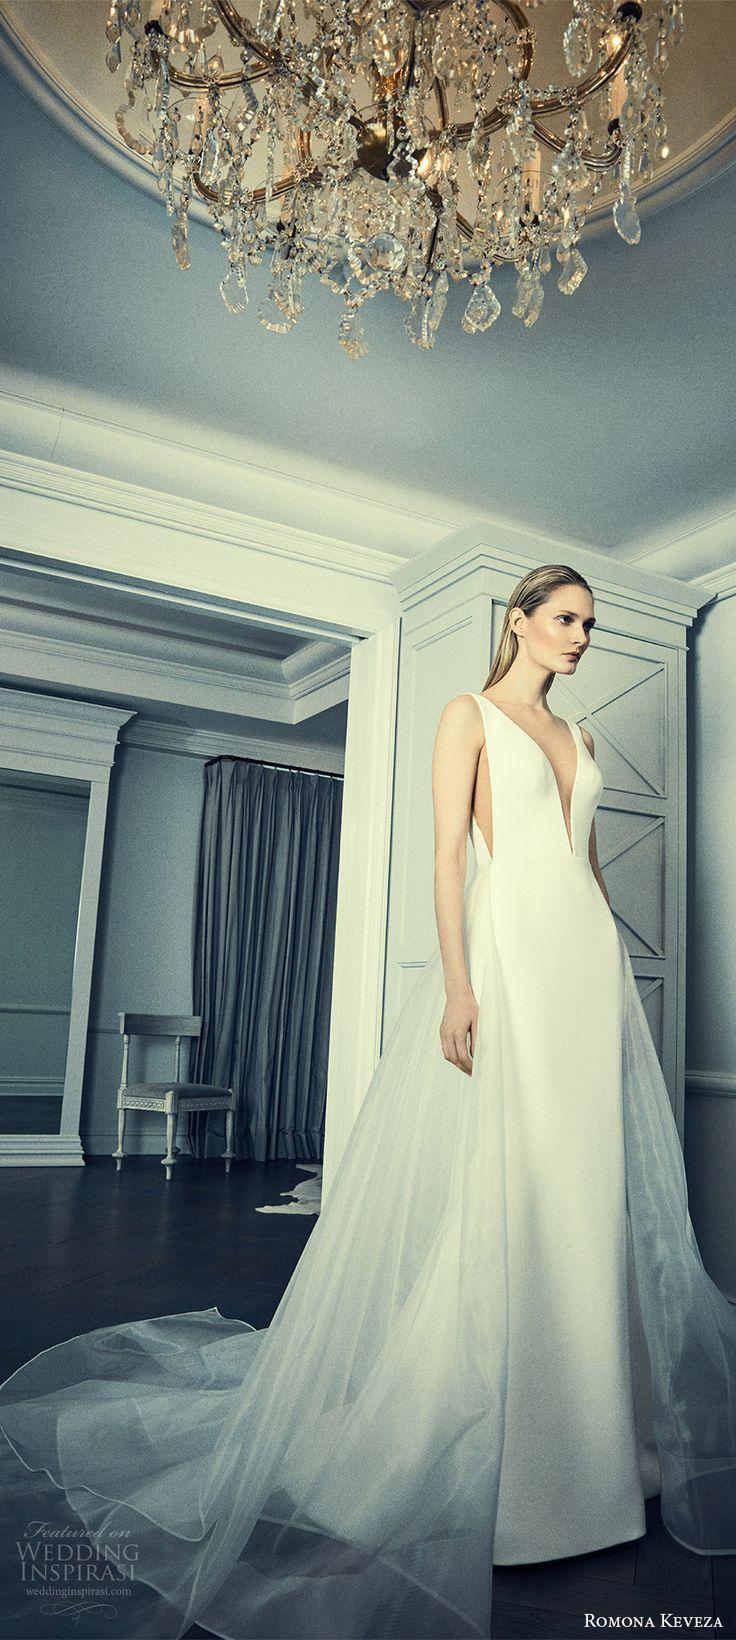 Romona Keveza Collection Spring 2018 Wedding Dresses